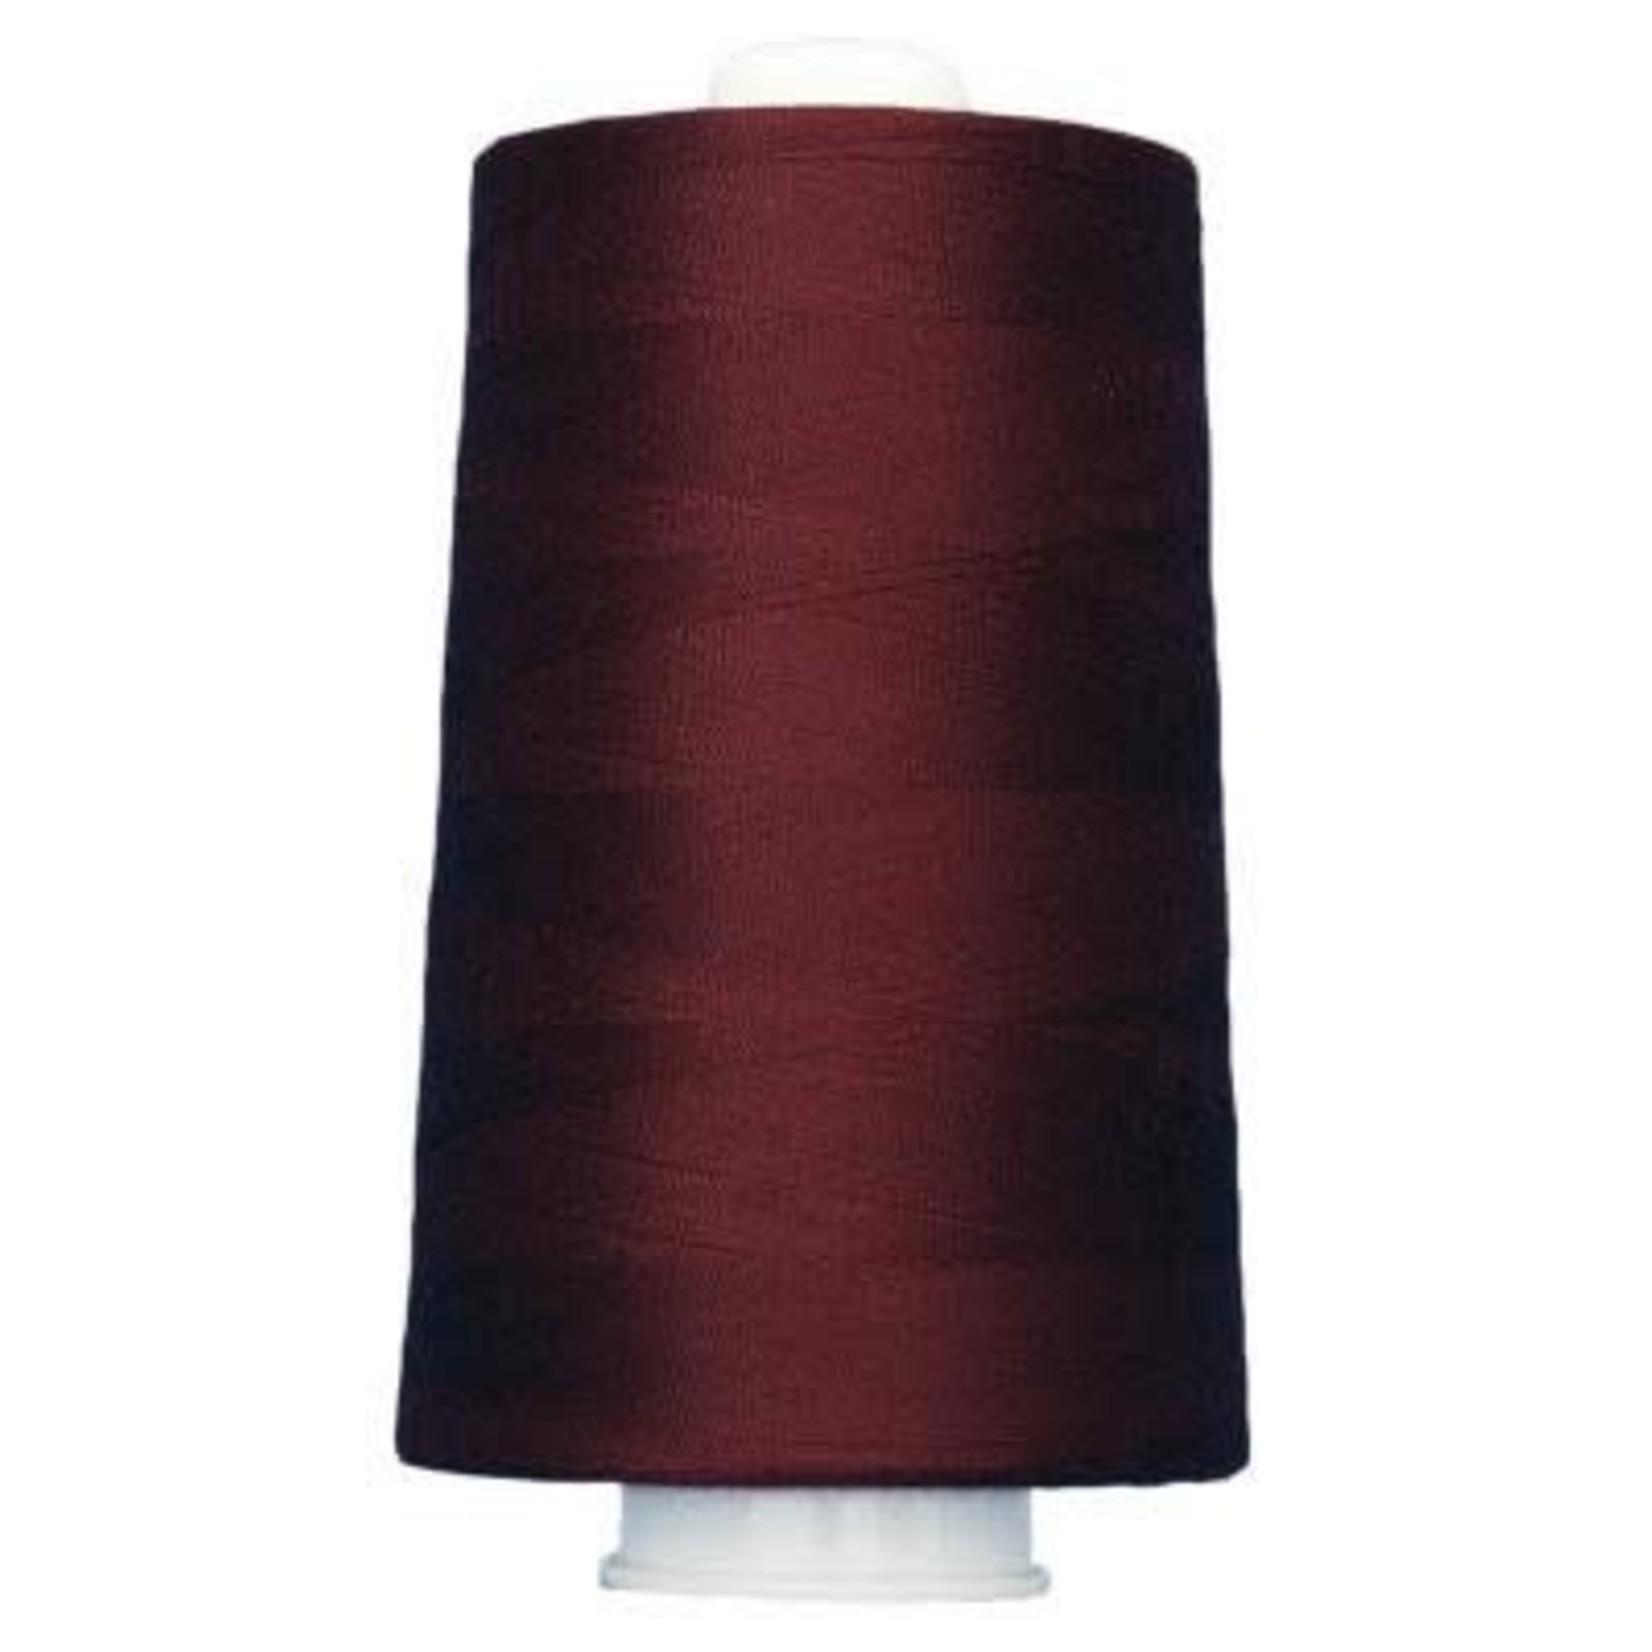 Superior Threads Omni 3146 Burgundy 6000 Yards